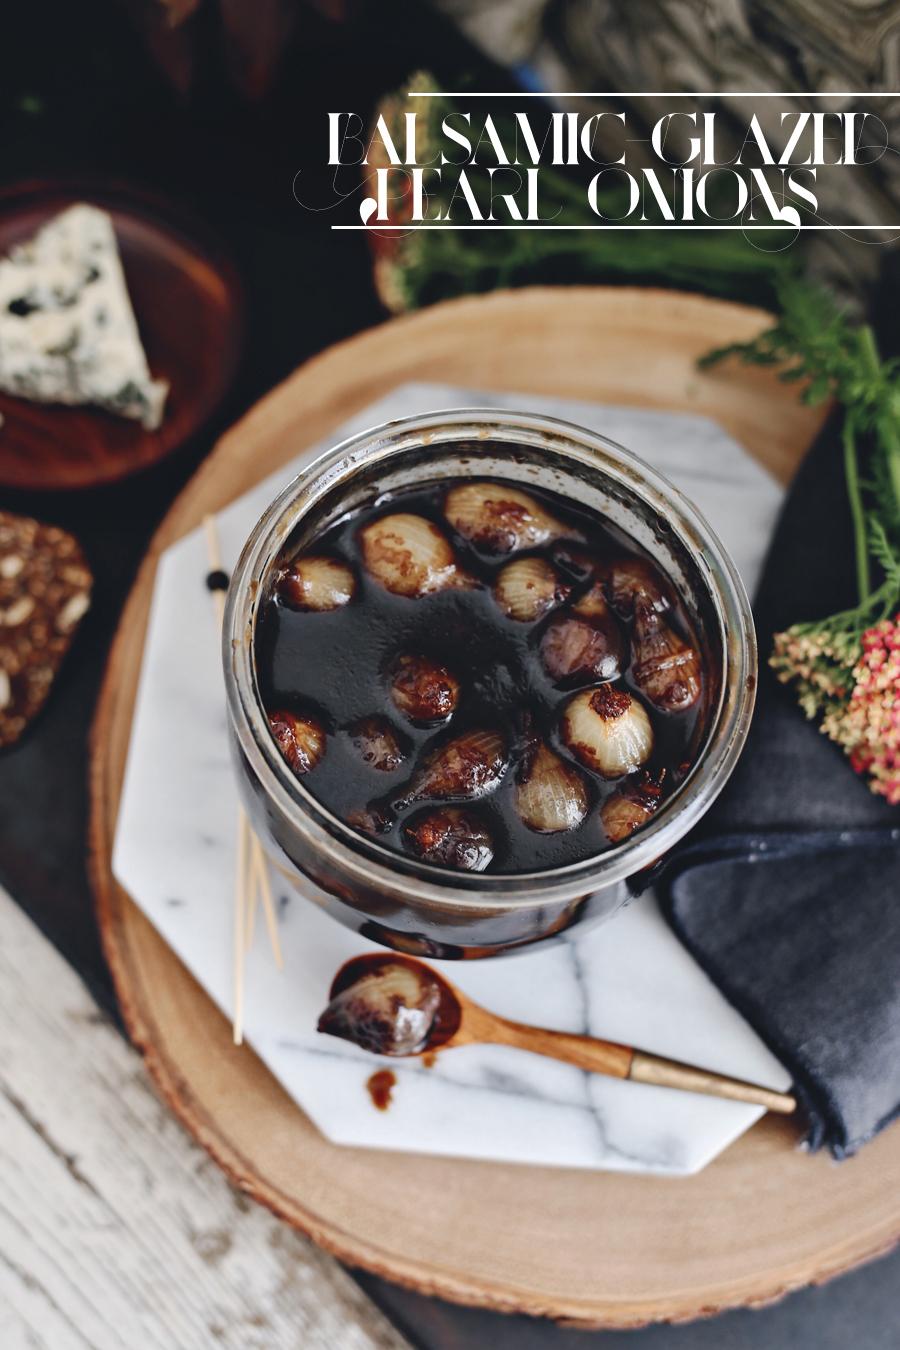 balsamic-glazed-pearl-onion-recipe-dine-x-design